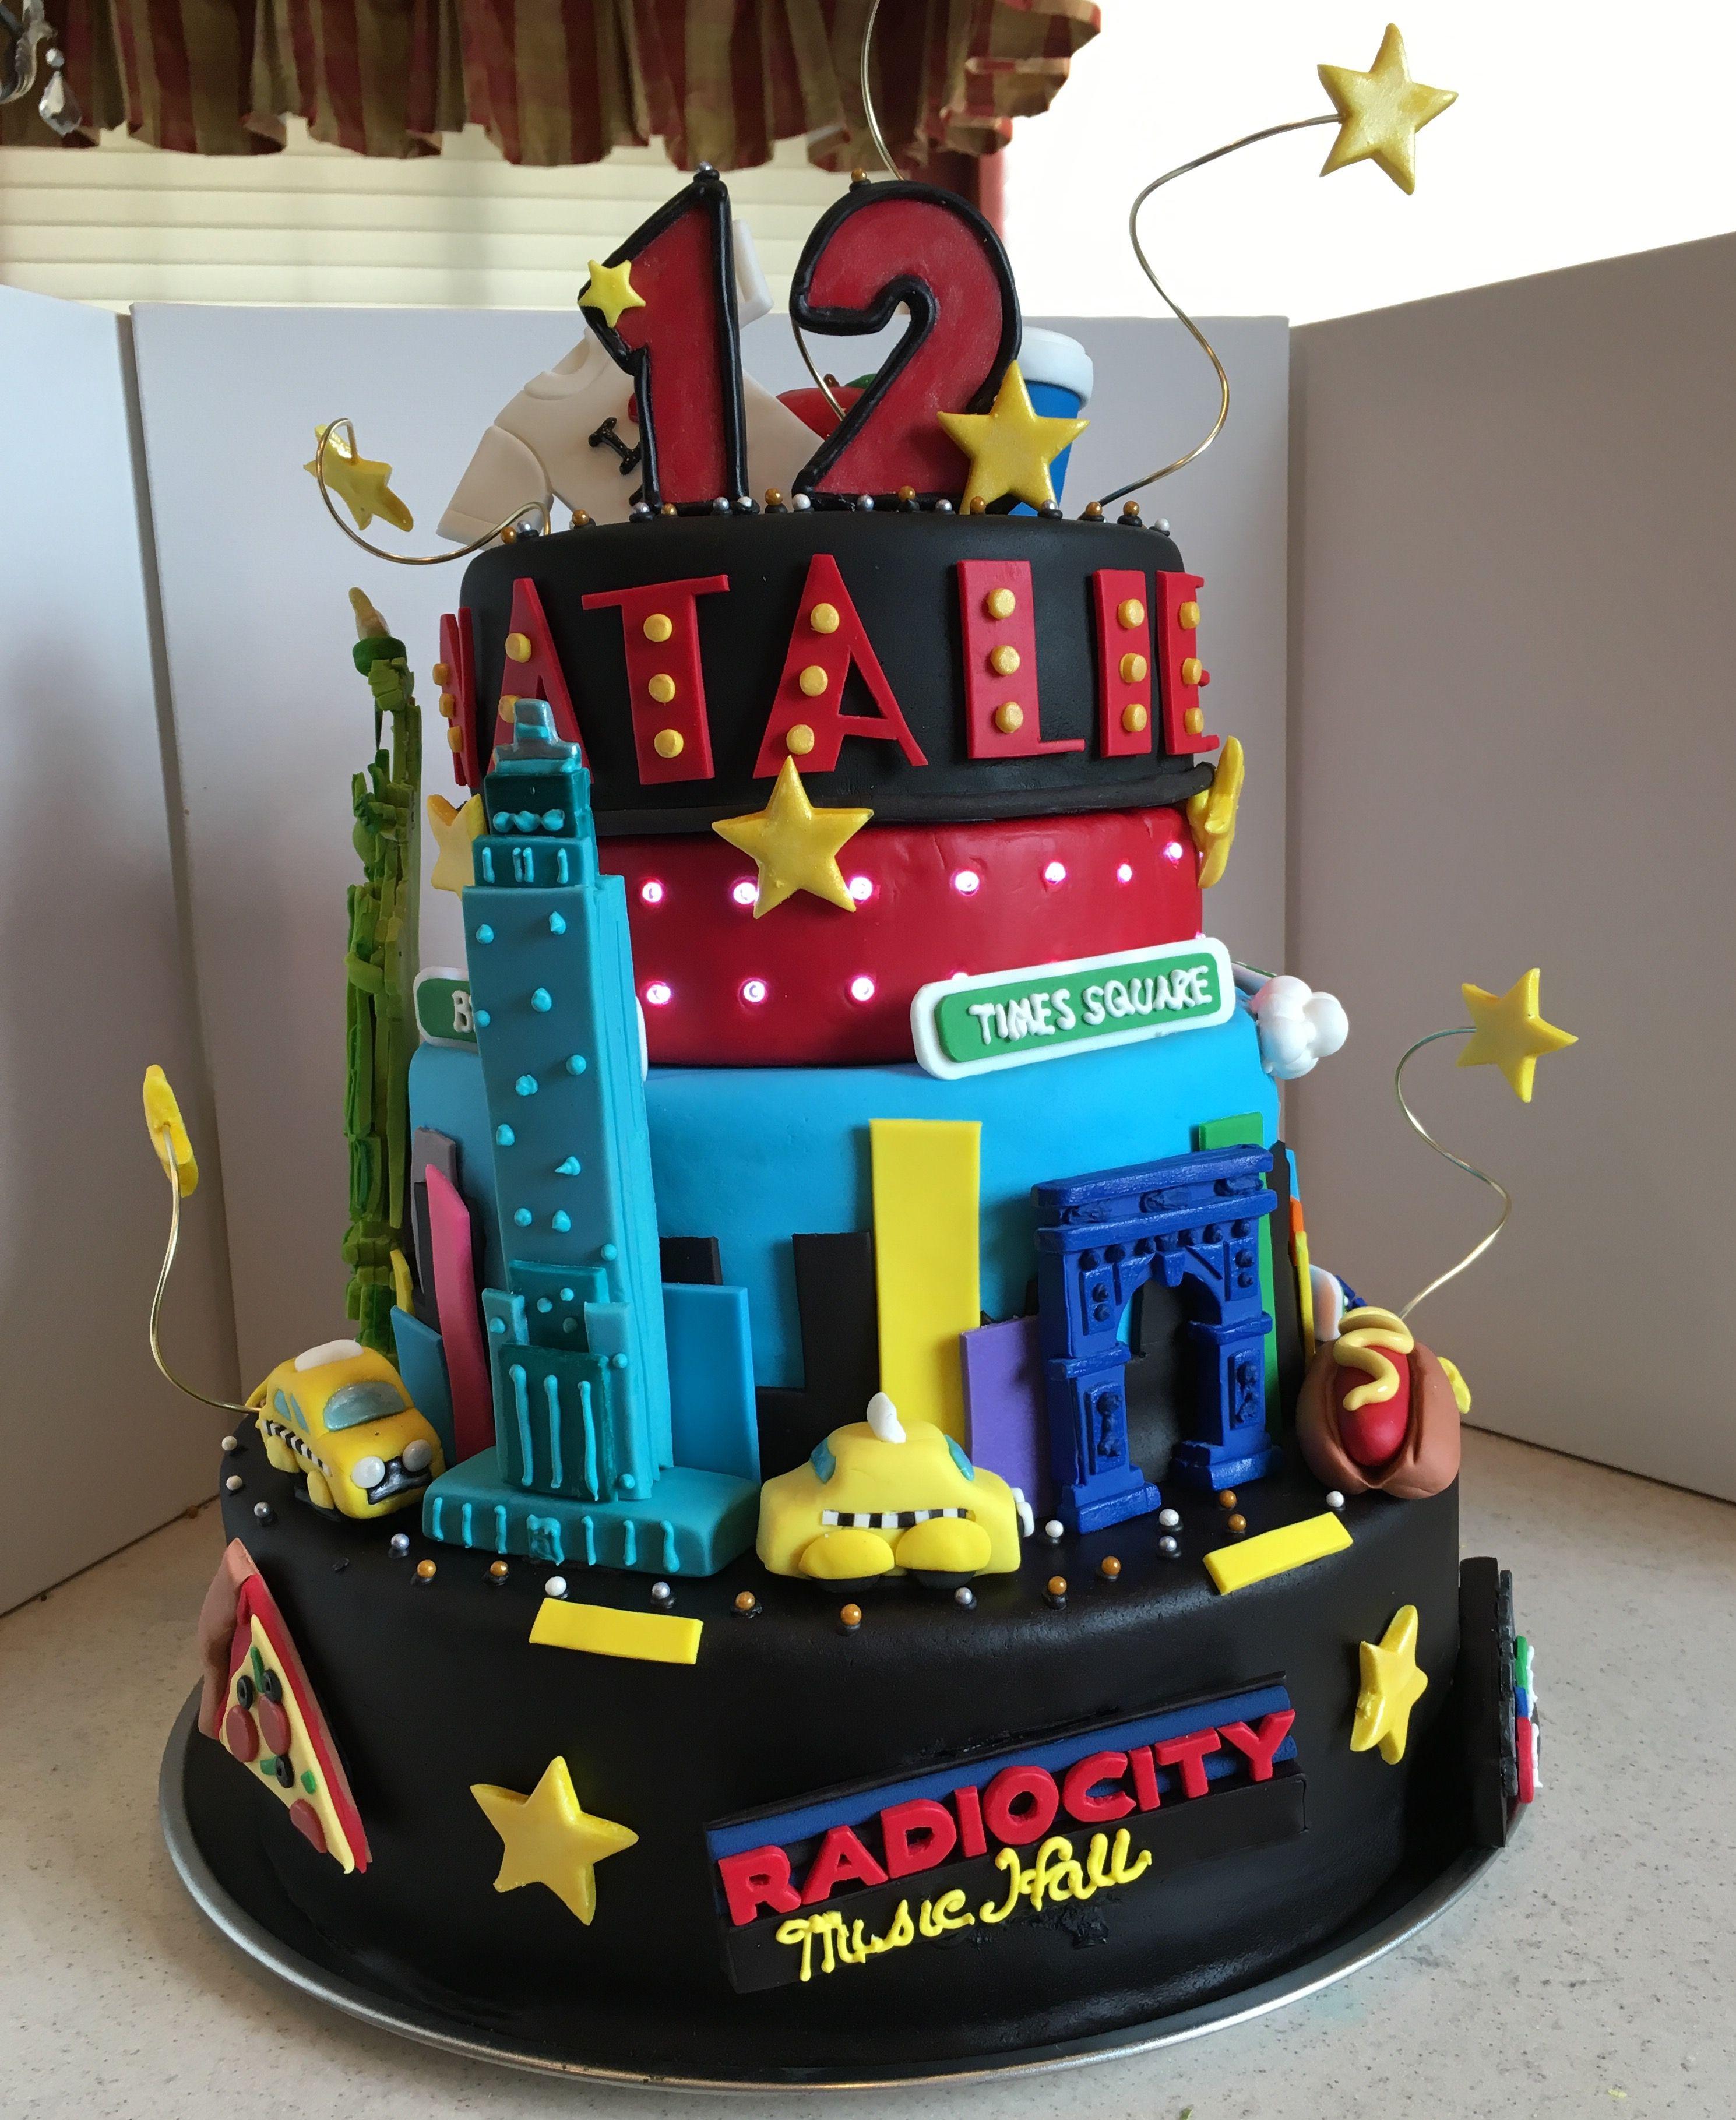 Awesome New York City Birthday Cake With Lights Cake Light Cakes Funny Birthday Cards Online Aboleapandamsfinfo